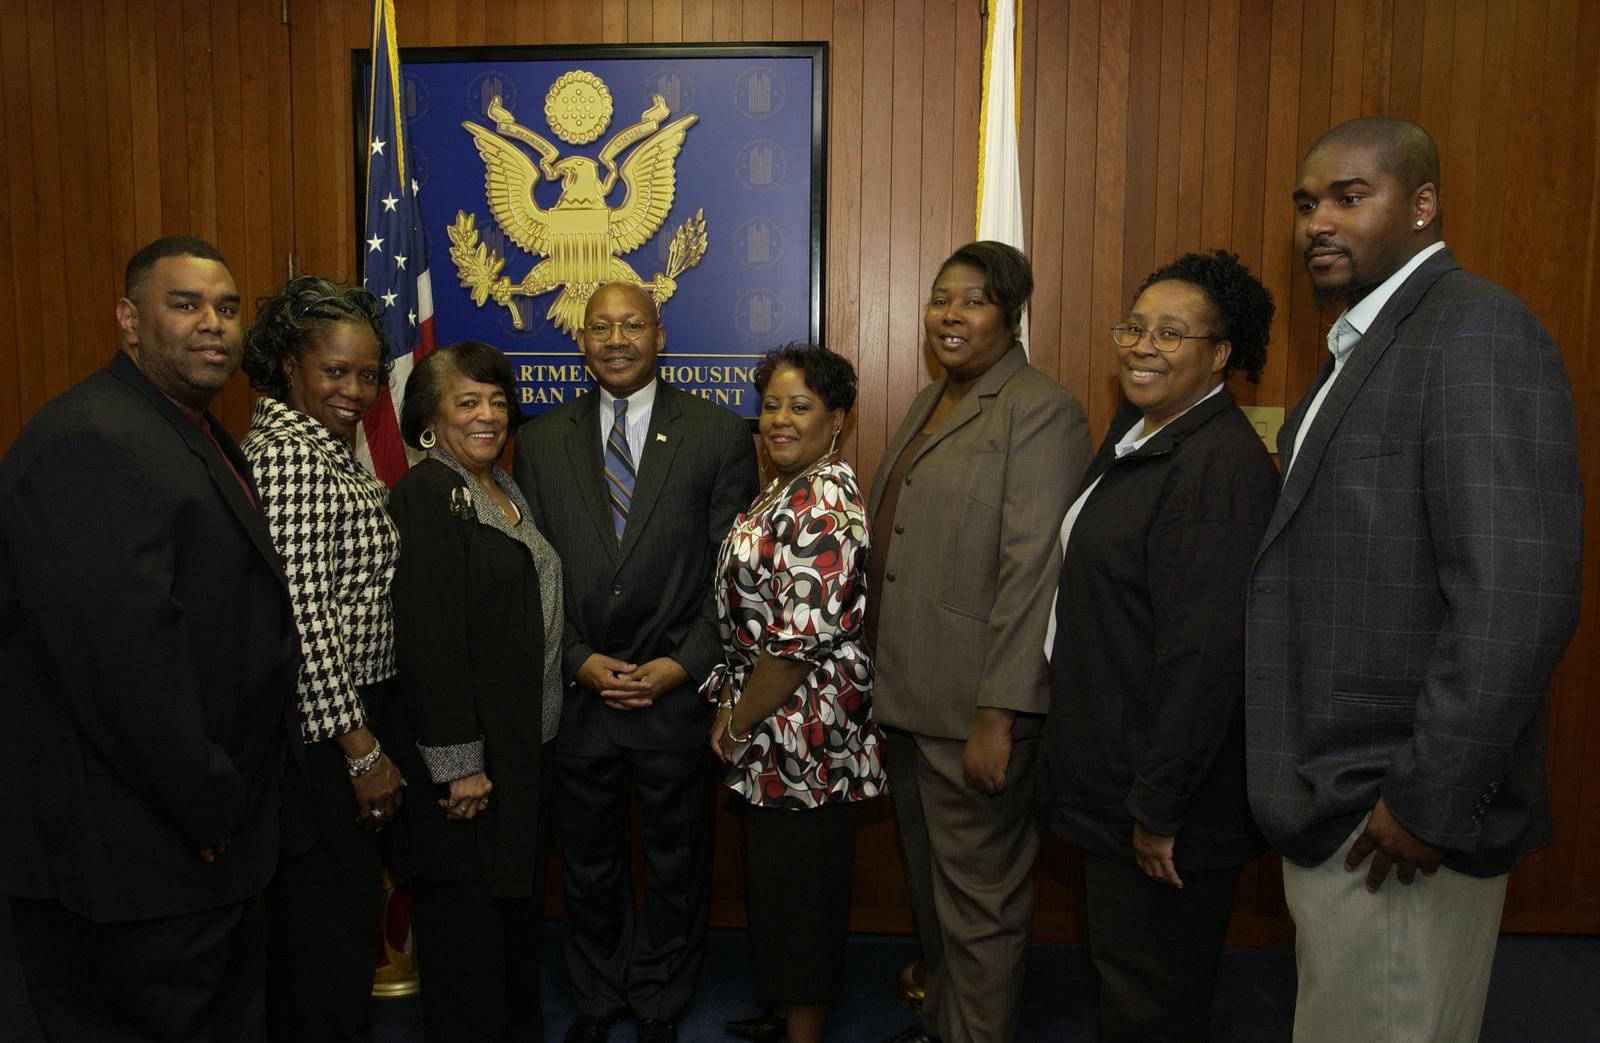 Secretary Alphonso Jackson with HUD Staff - Secretary Alphonso Jackson posing with HUD staff during final week at HUD